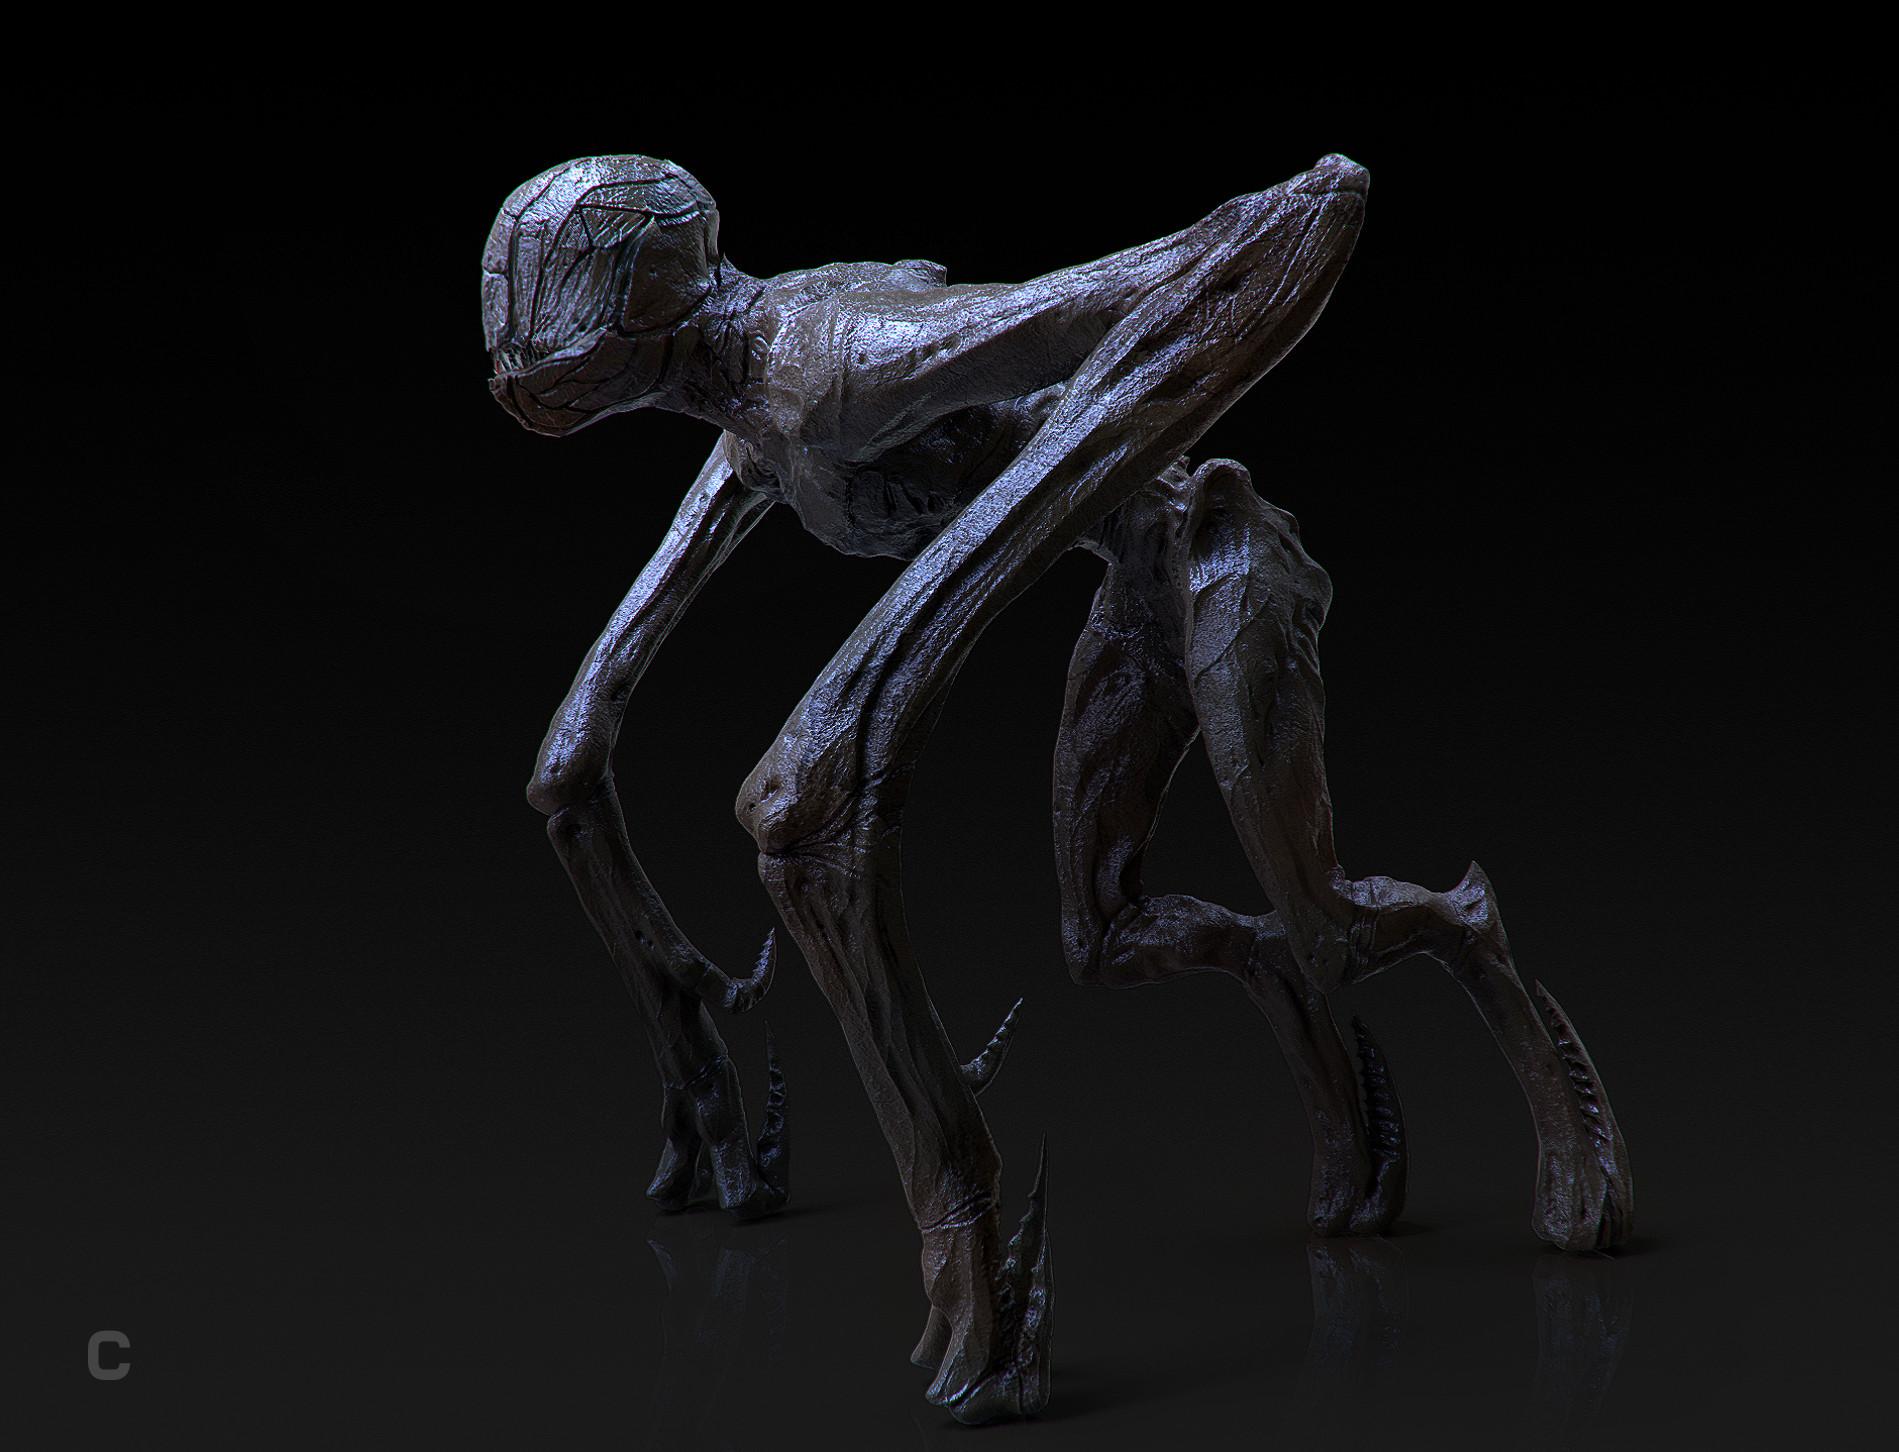 Luis carrasco quietplace creature lc 6a 03